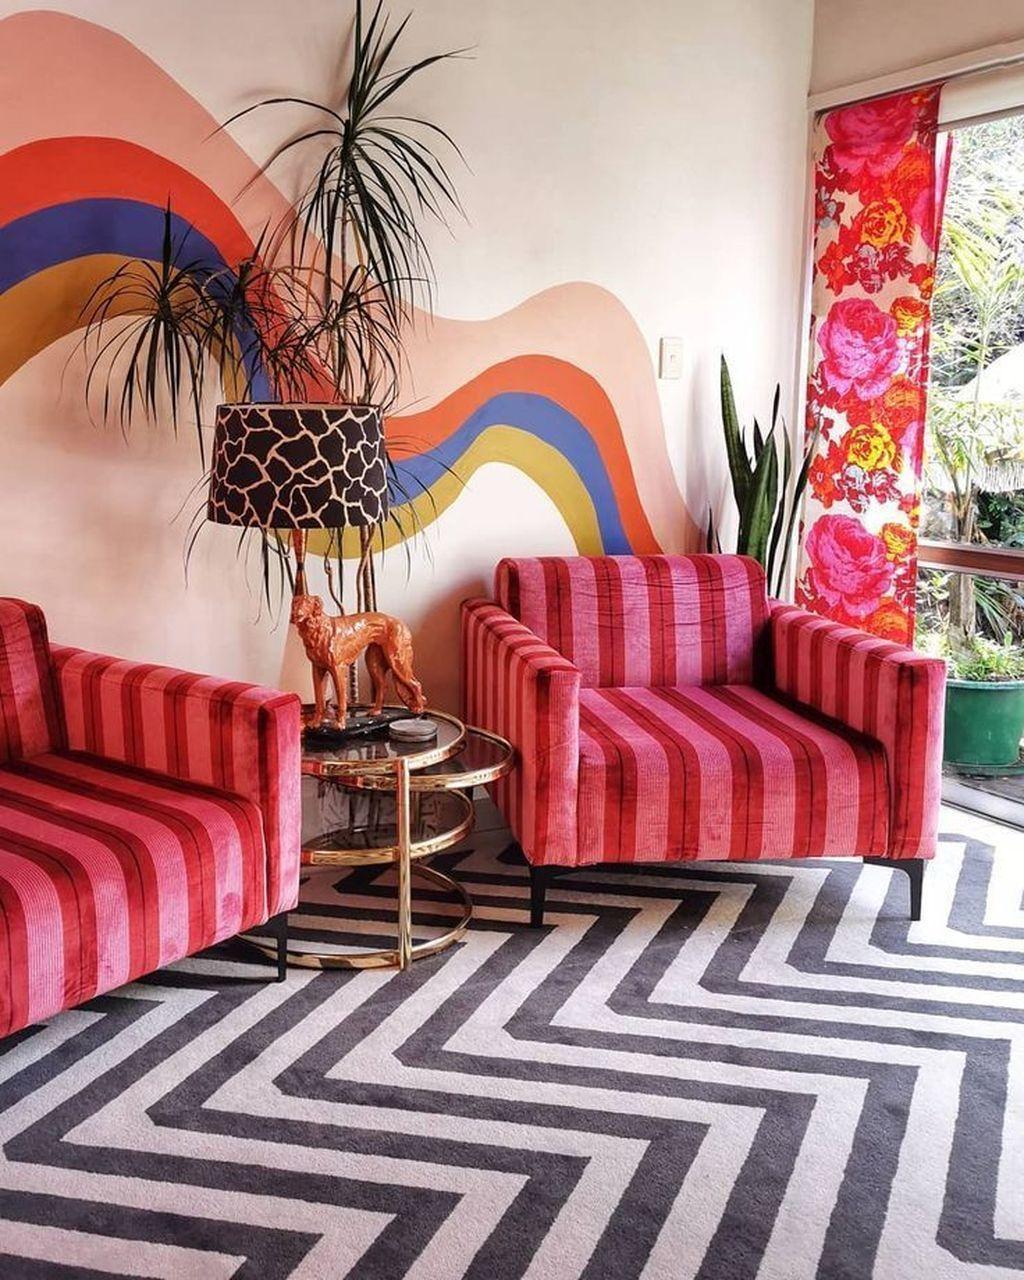 36 Stunning Colorful Interior Design Ideas Colorful Interior